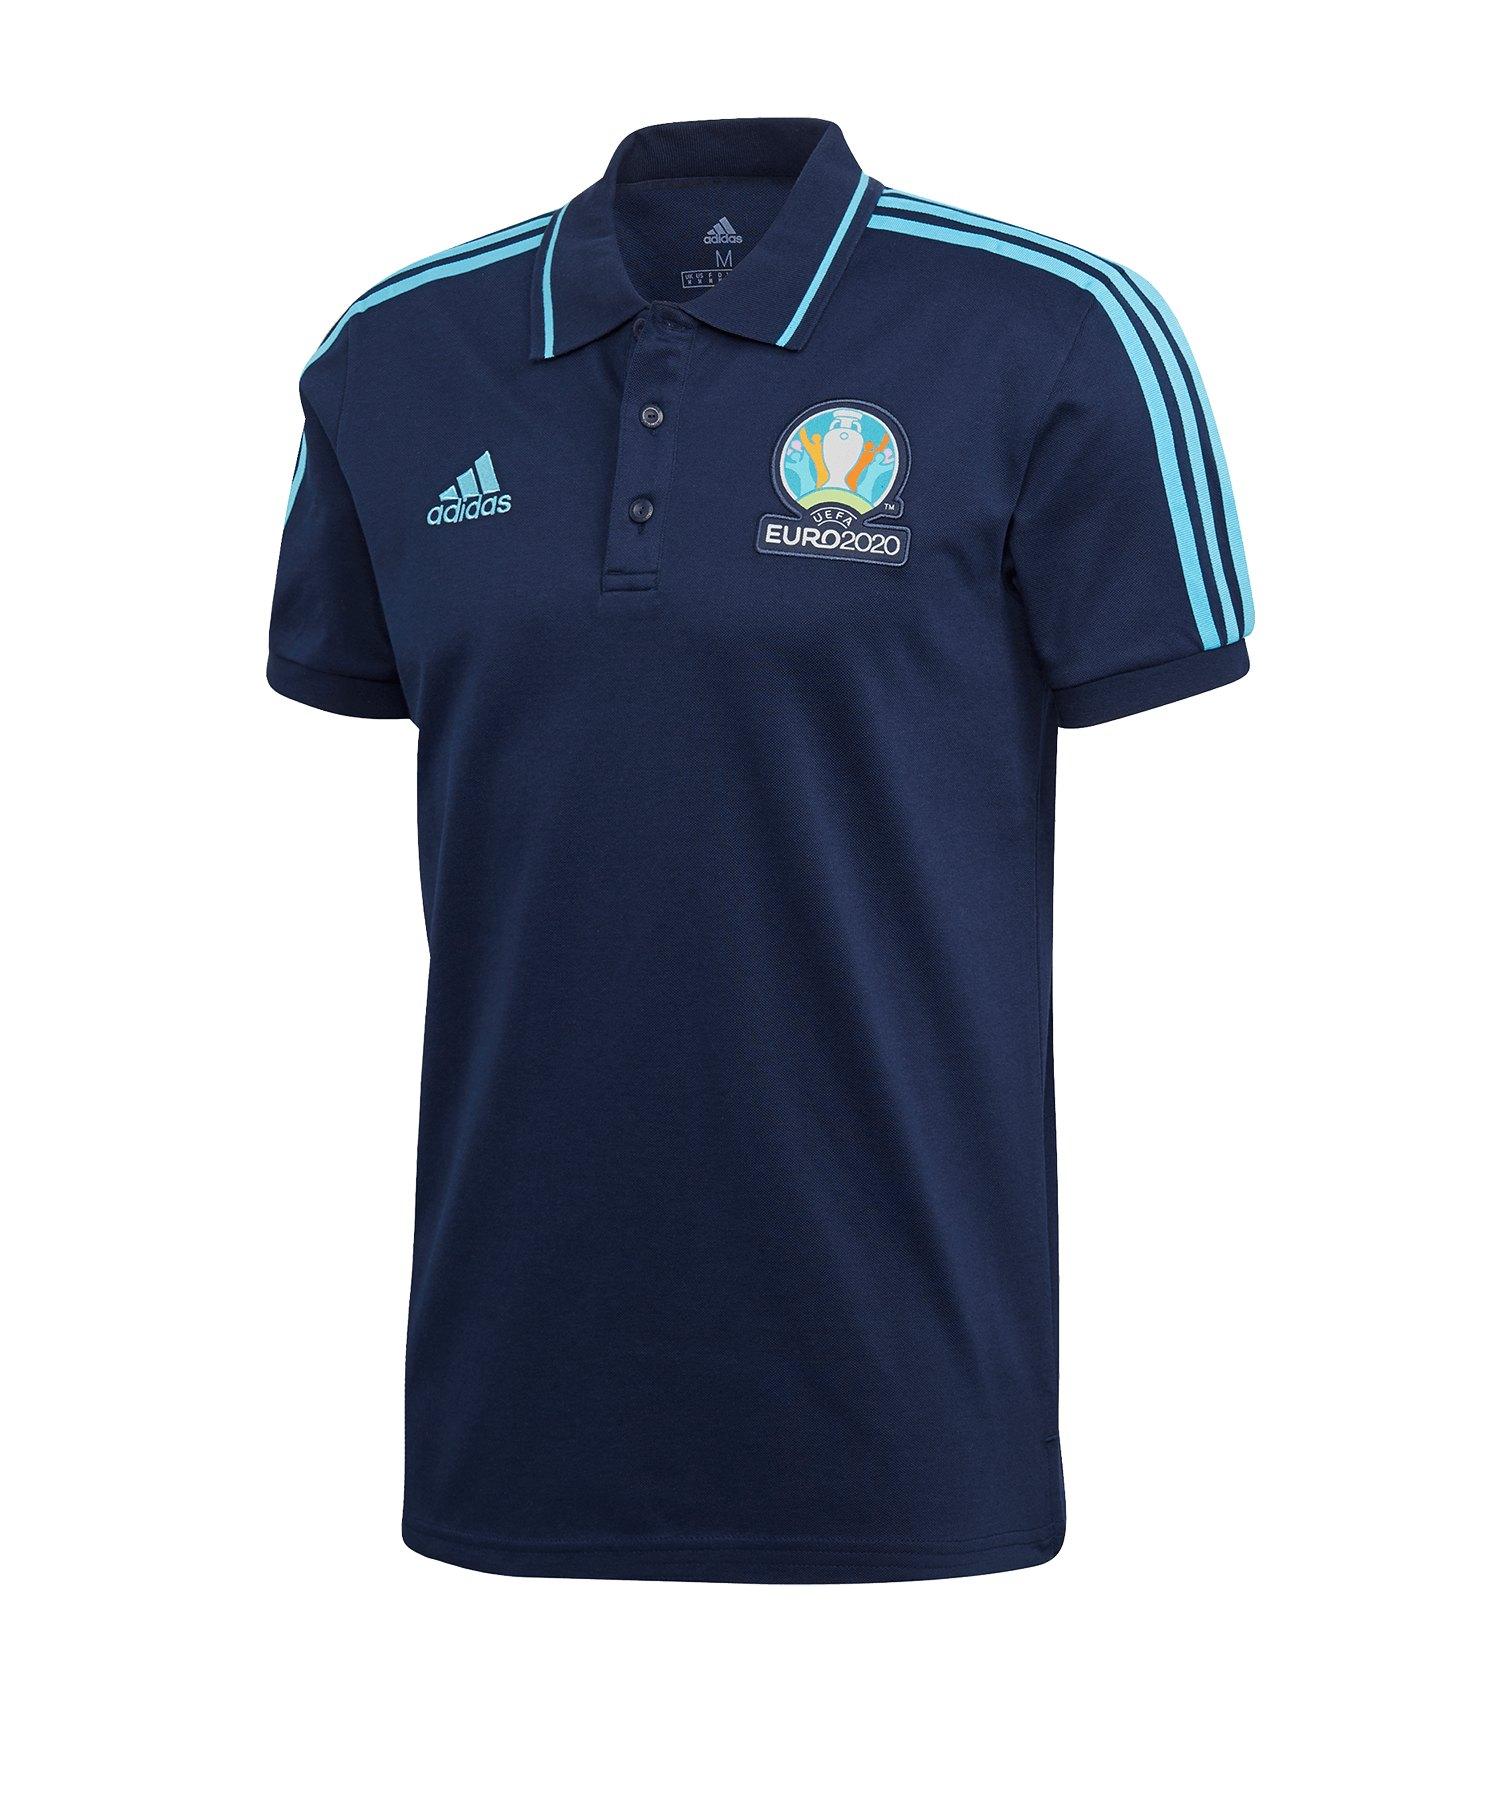 adidas UEFA EM 2020 Poloshirt Blau - blau